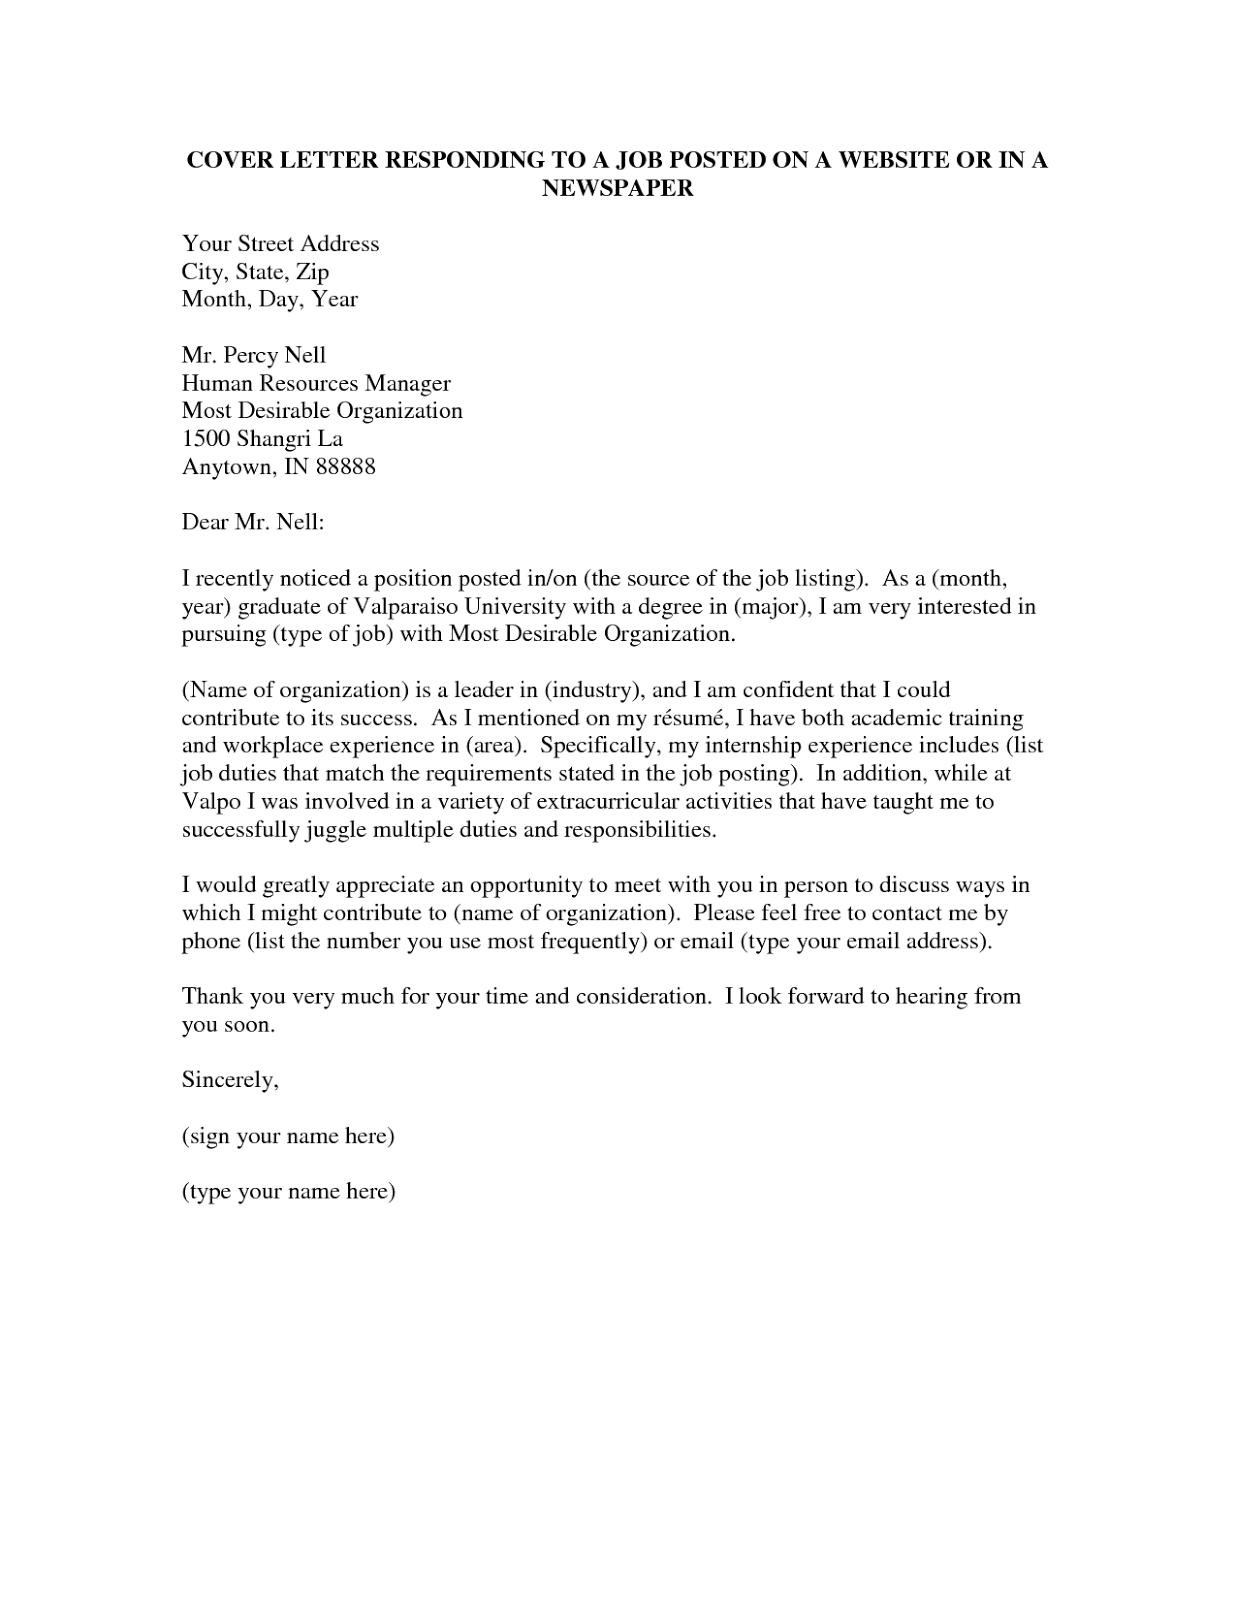 Cover Letter – Job Posting Cover Letter